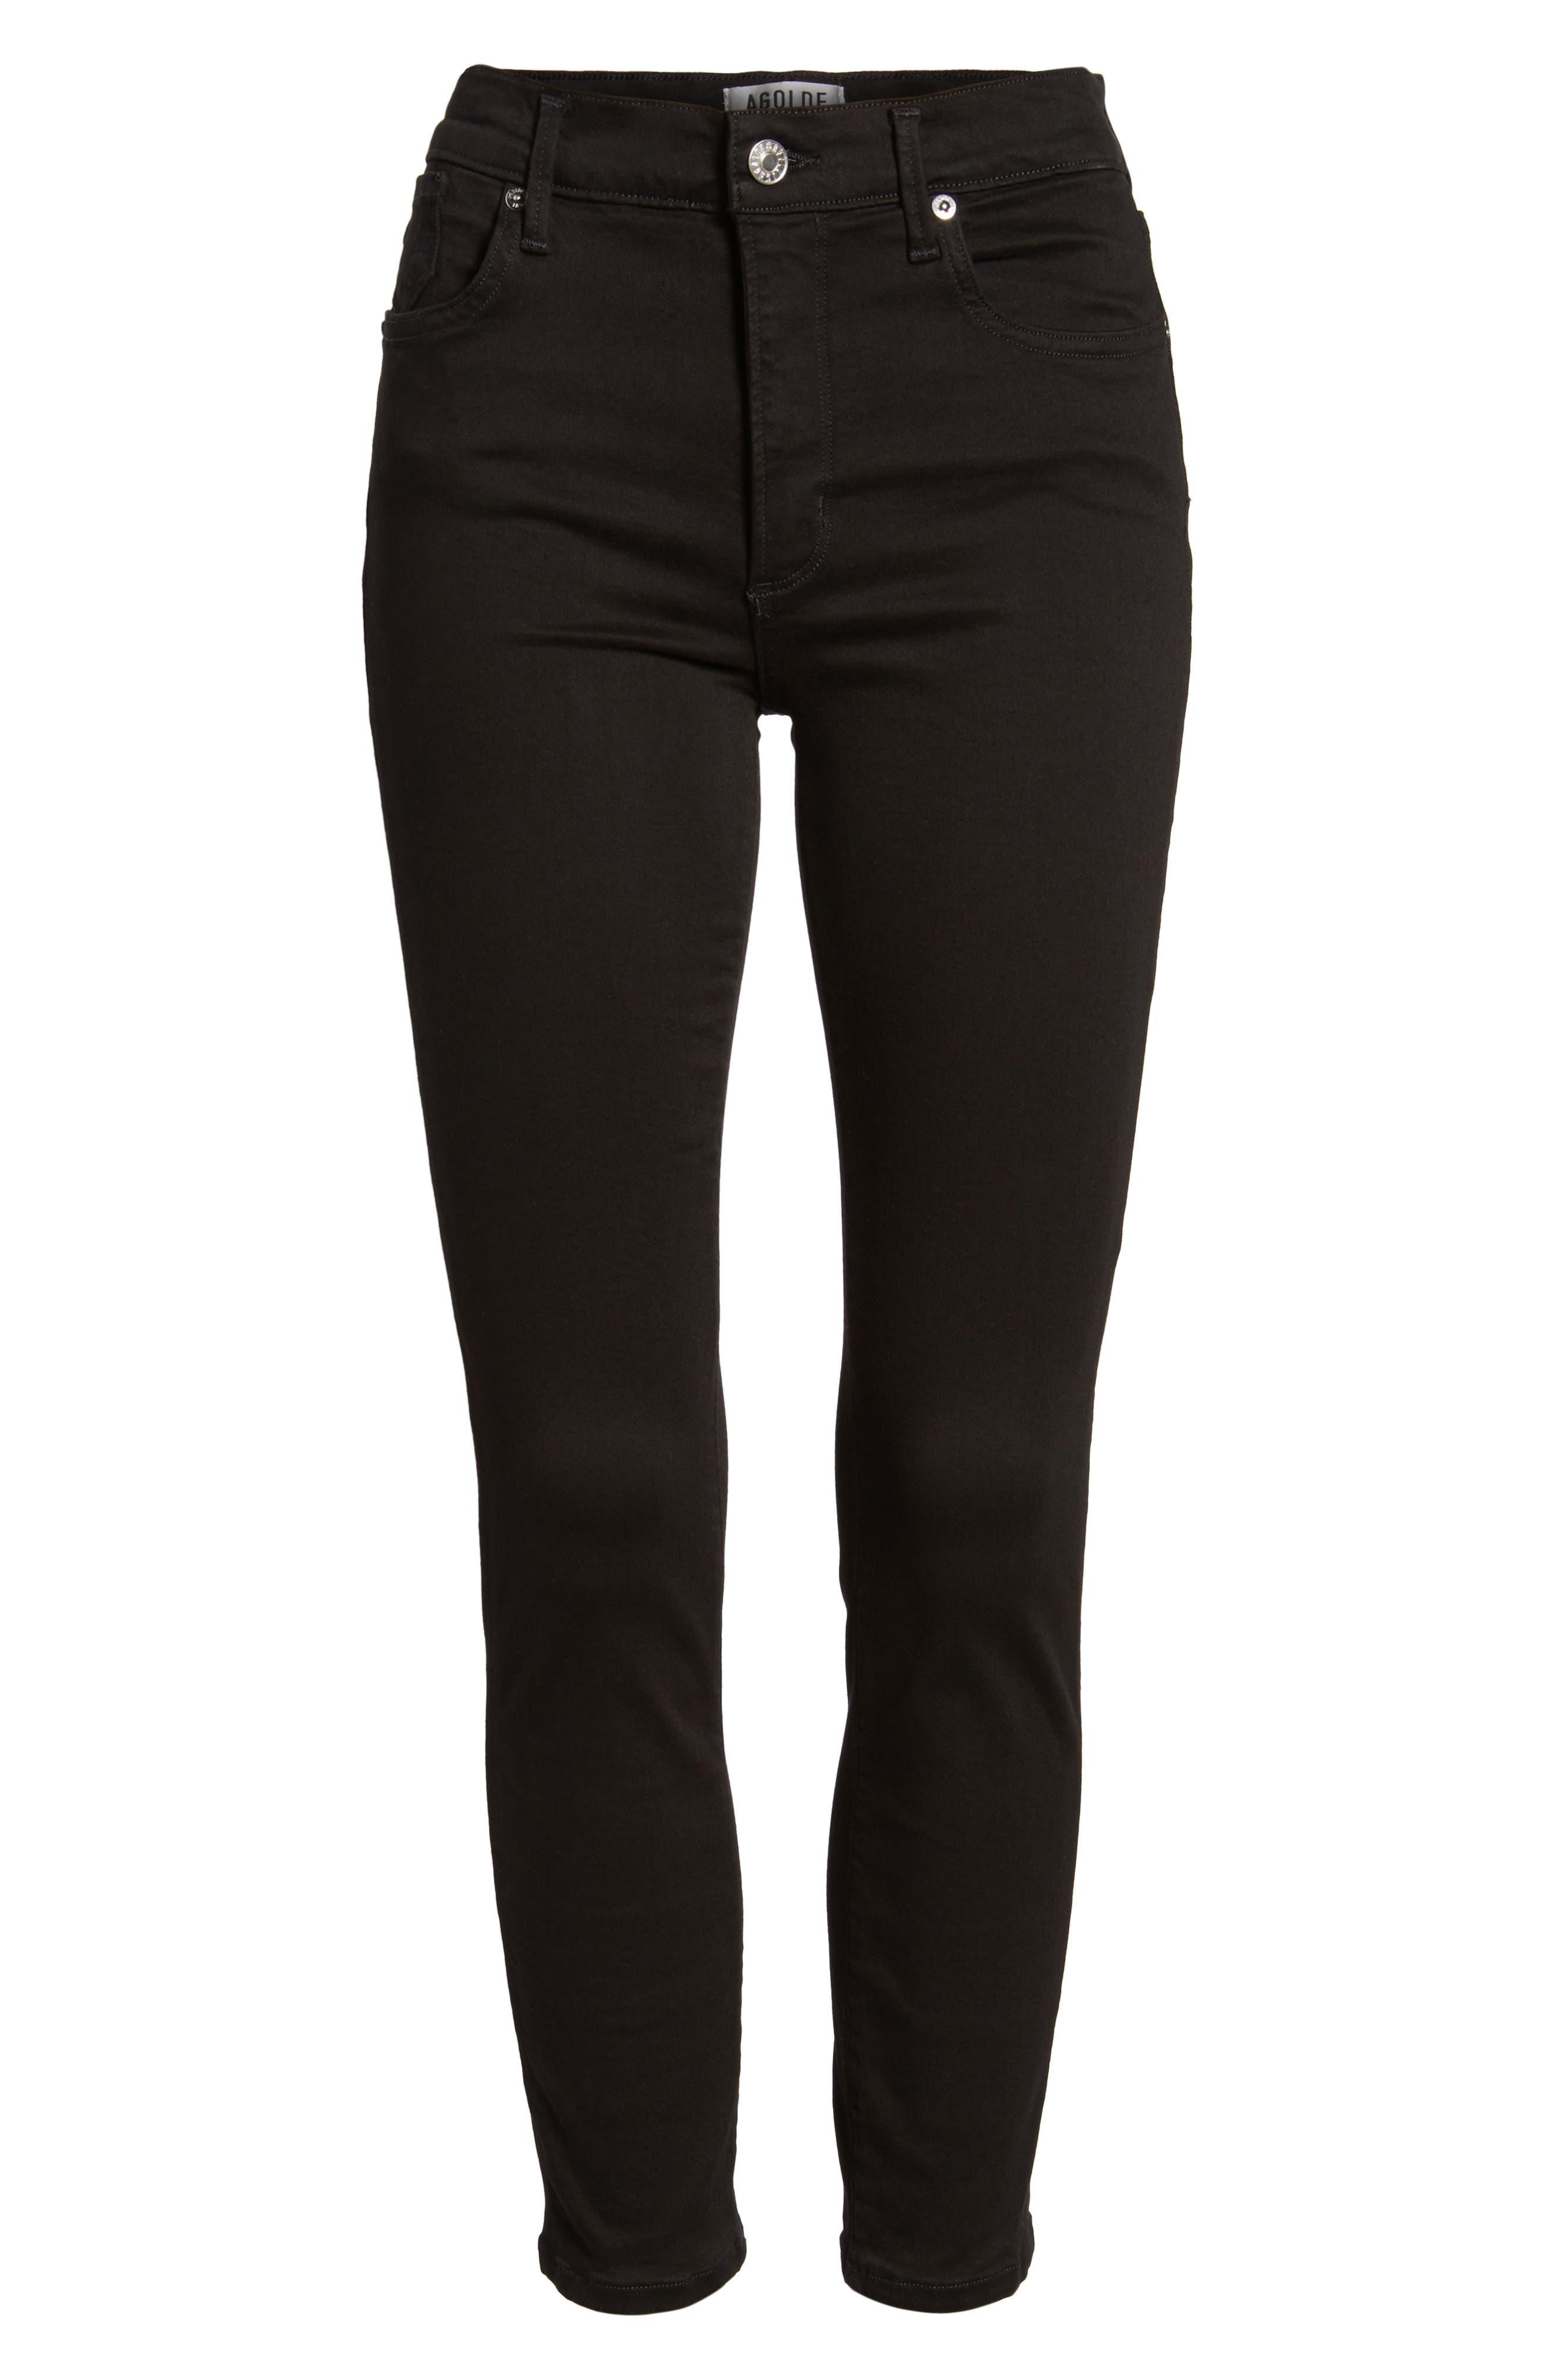 Sophie High Waist Crop Skinny Jeans,                             Alternate thumbnail 6, color,                             JET